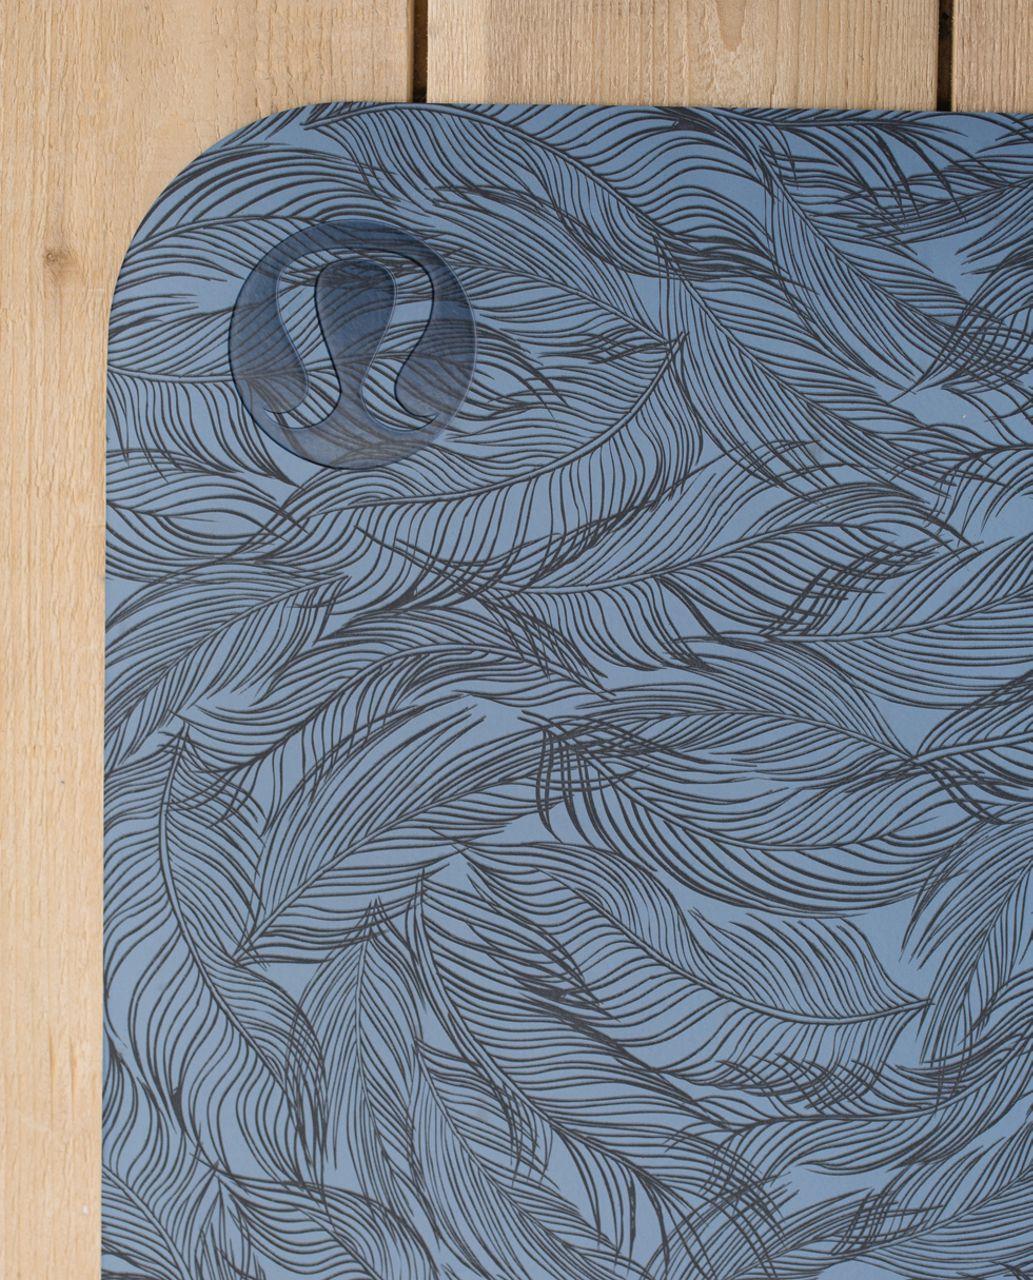 Lululemon The Reversible Mat 5mm - Sketchy Palm Blue Denim Deep Coal / Deep Coal